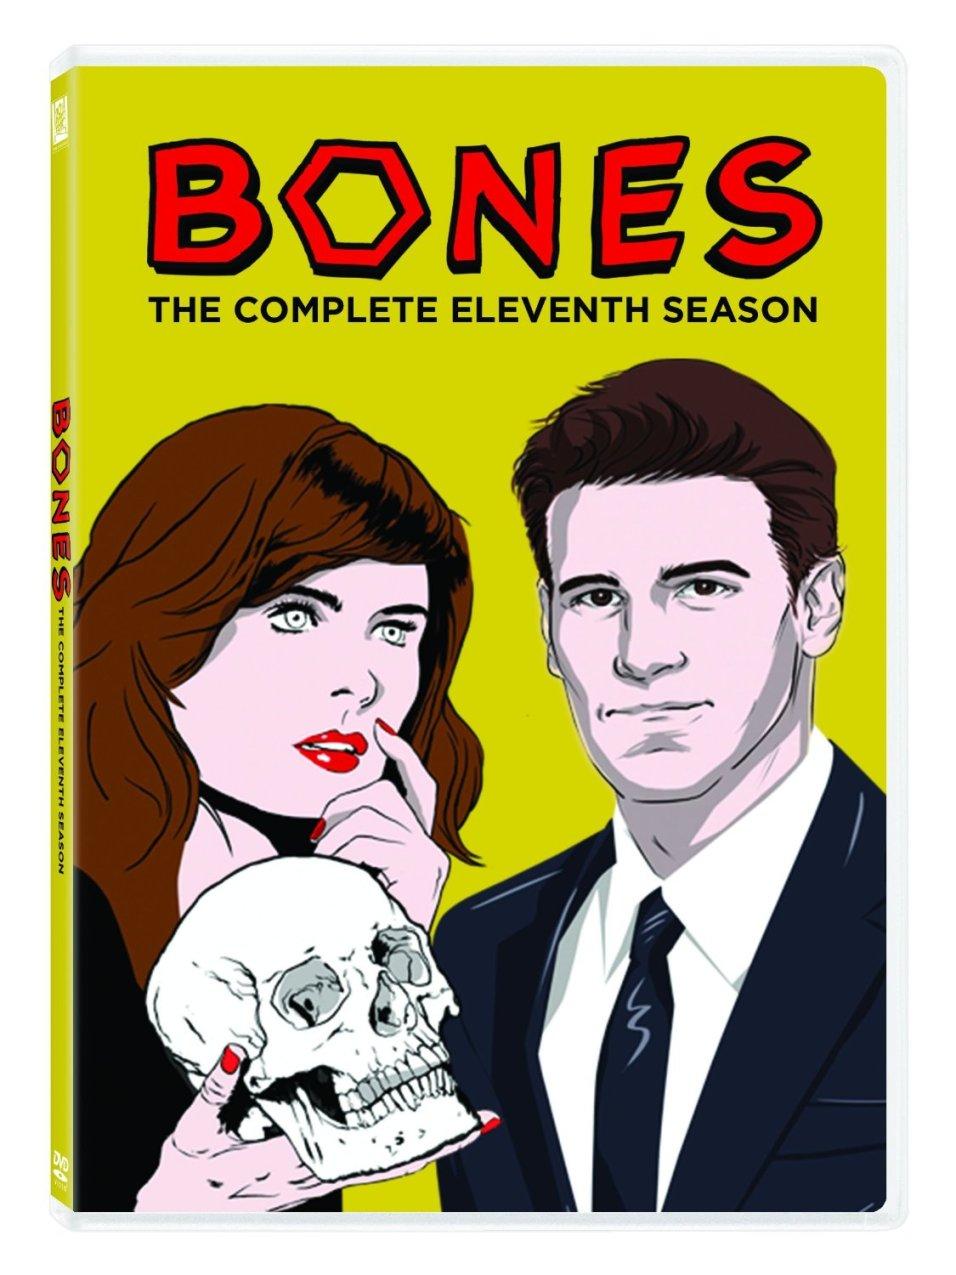 copertina dvd americani Bones 11